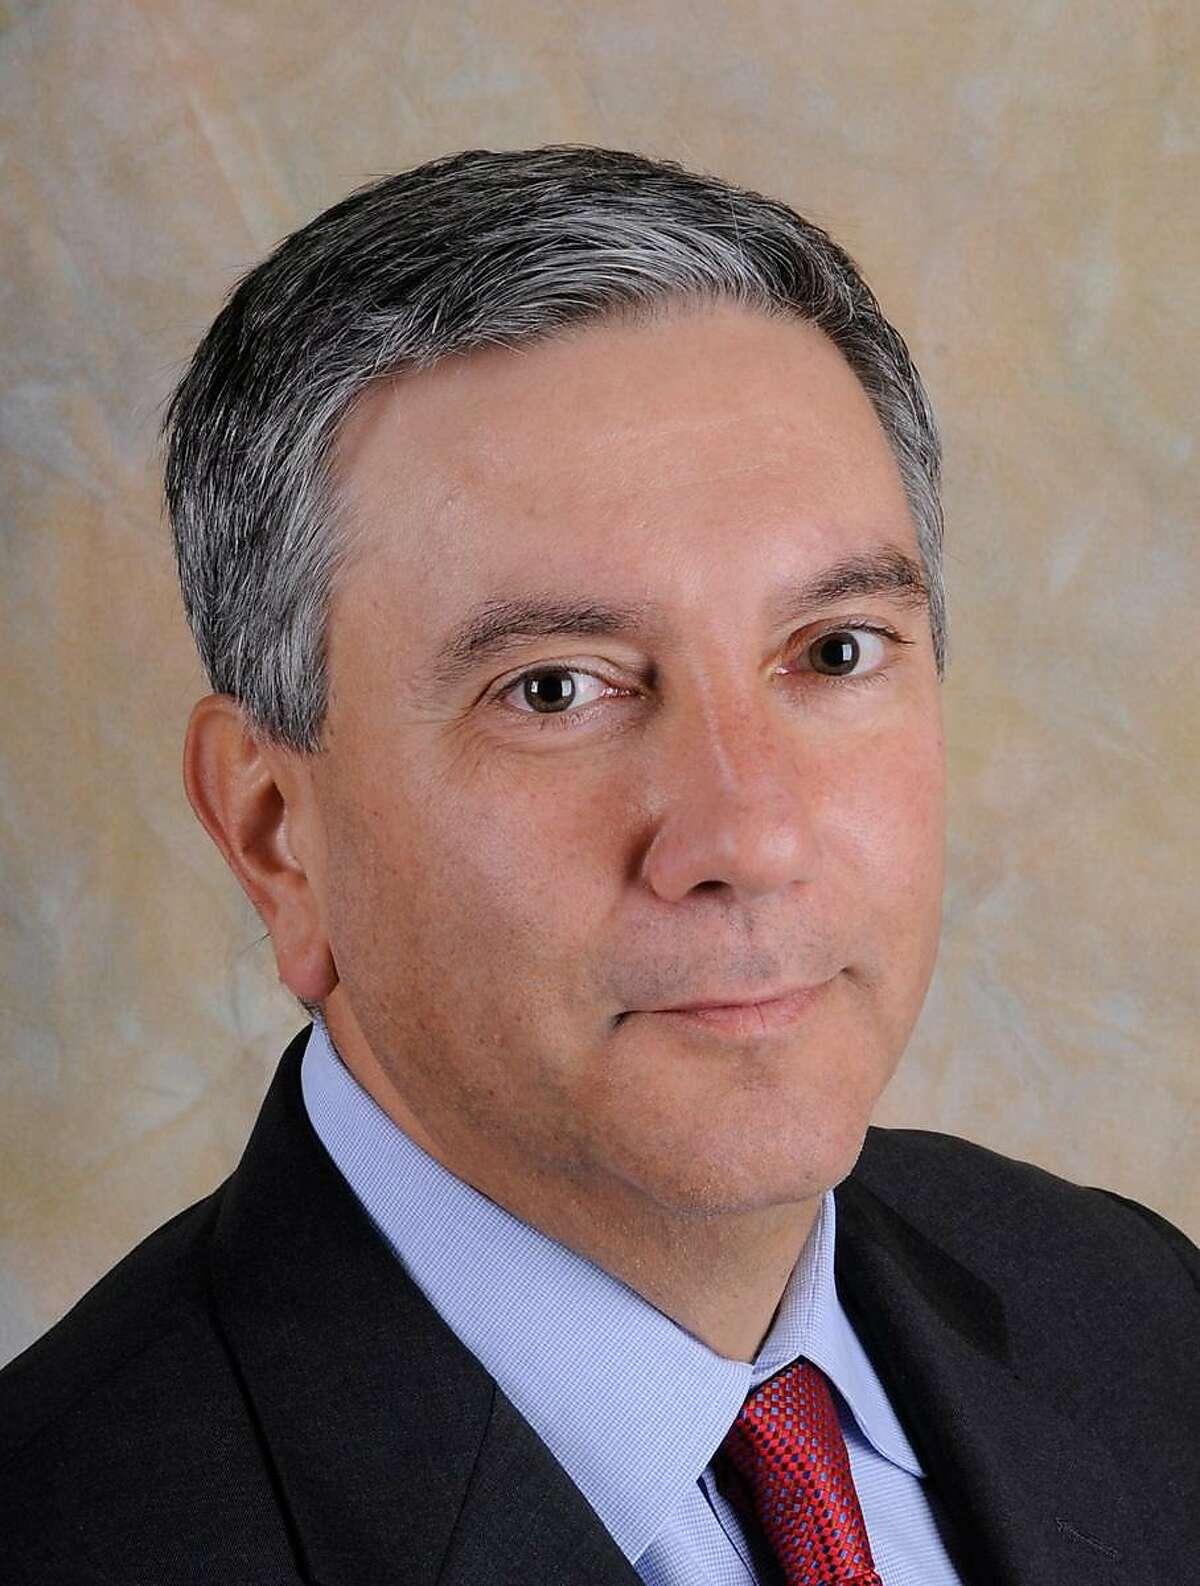 Keysight Technologies CEO Ron Nersesian